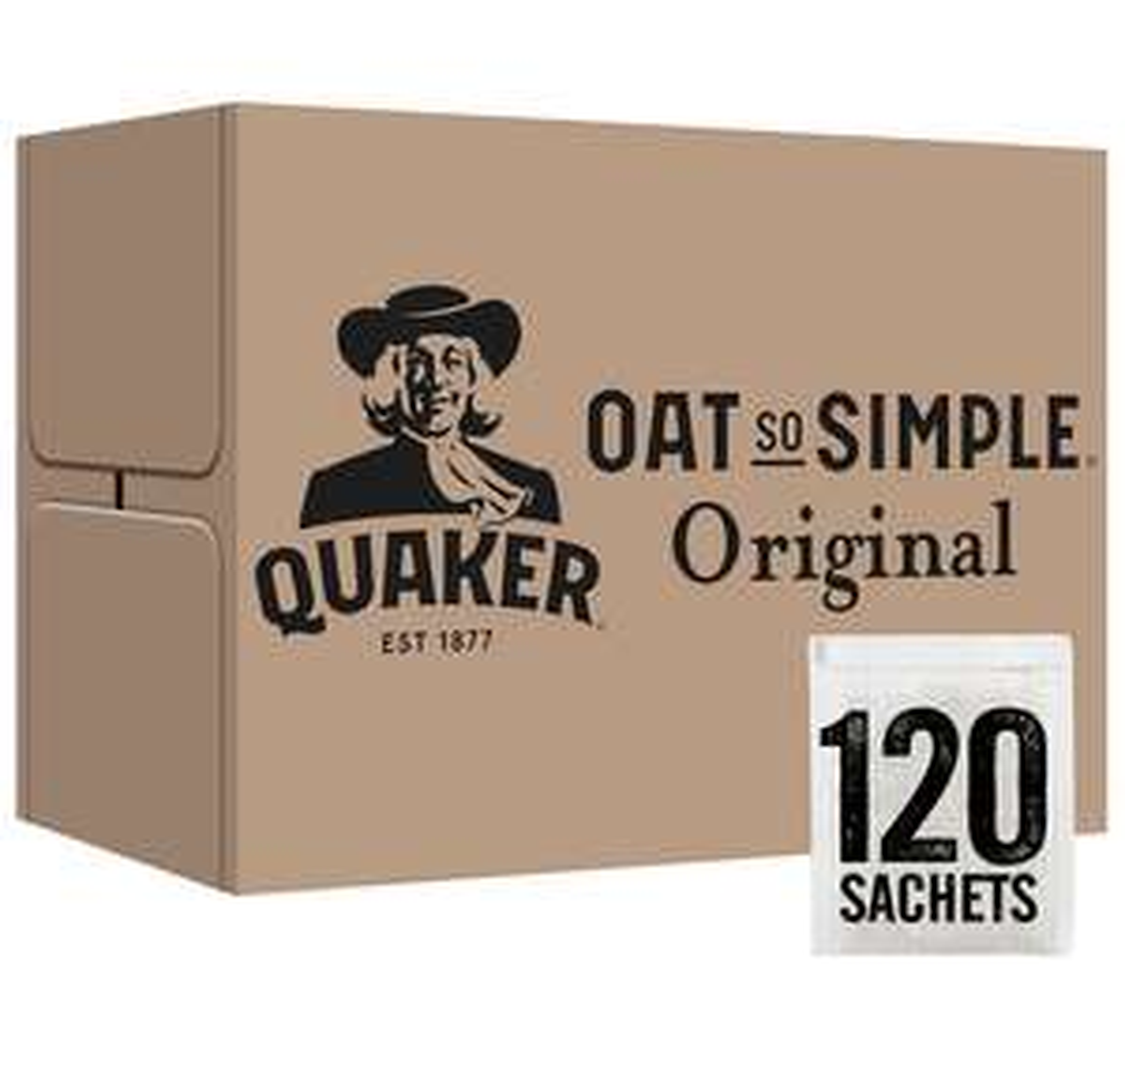 Quaker Oat So Simple Original Porridge Sachets, 27 g (Pack of 120) £12.99 + £4.49 NP @ Amazon